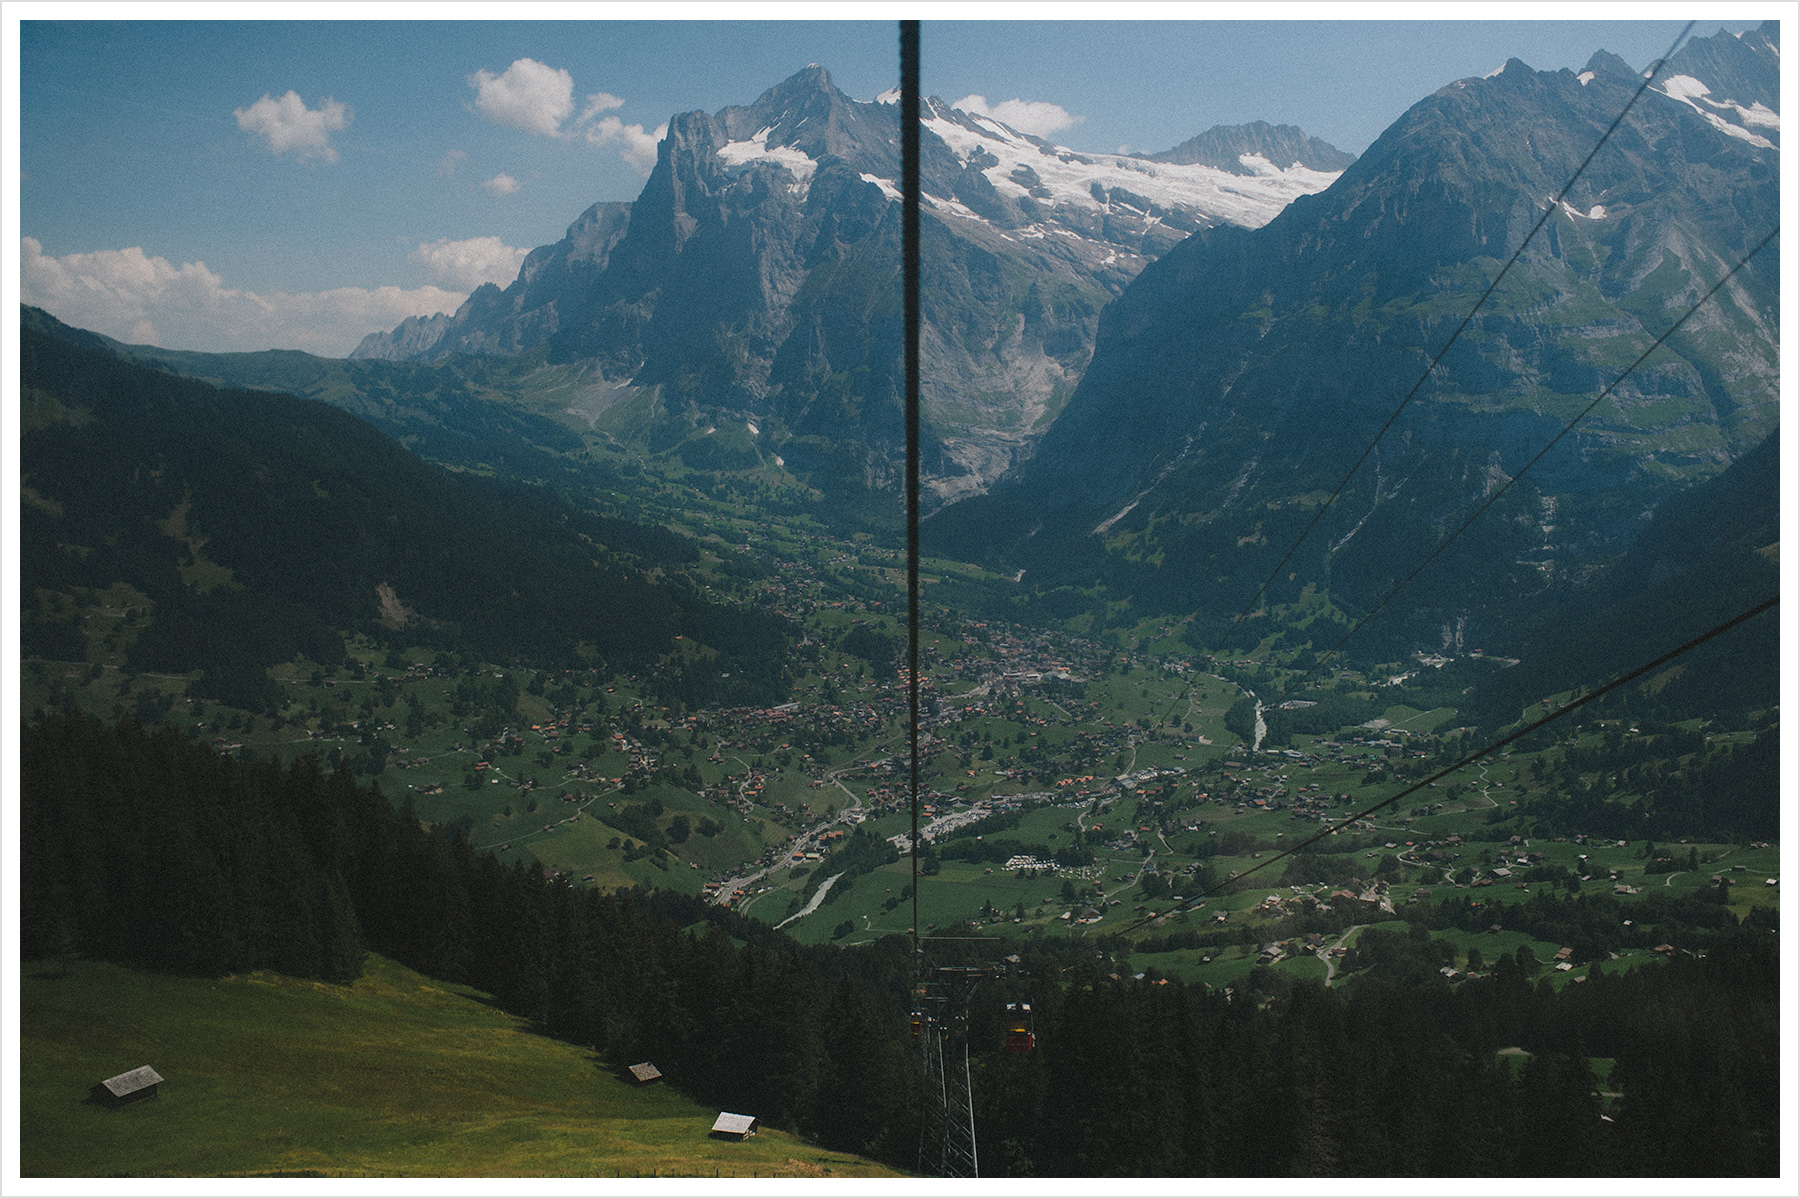 20150806_SWITZERLAND_05_041_DSC_8081.jpg